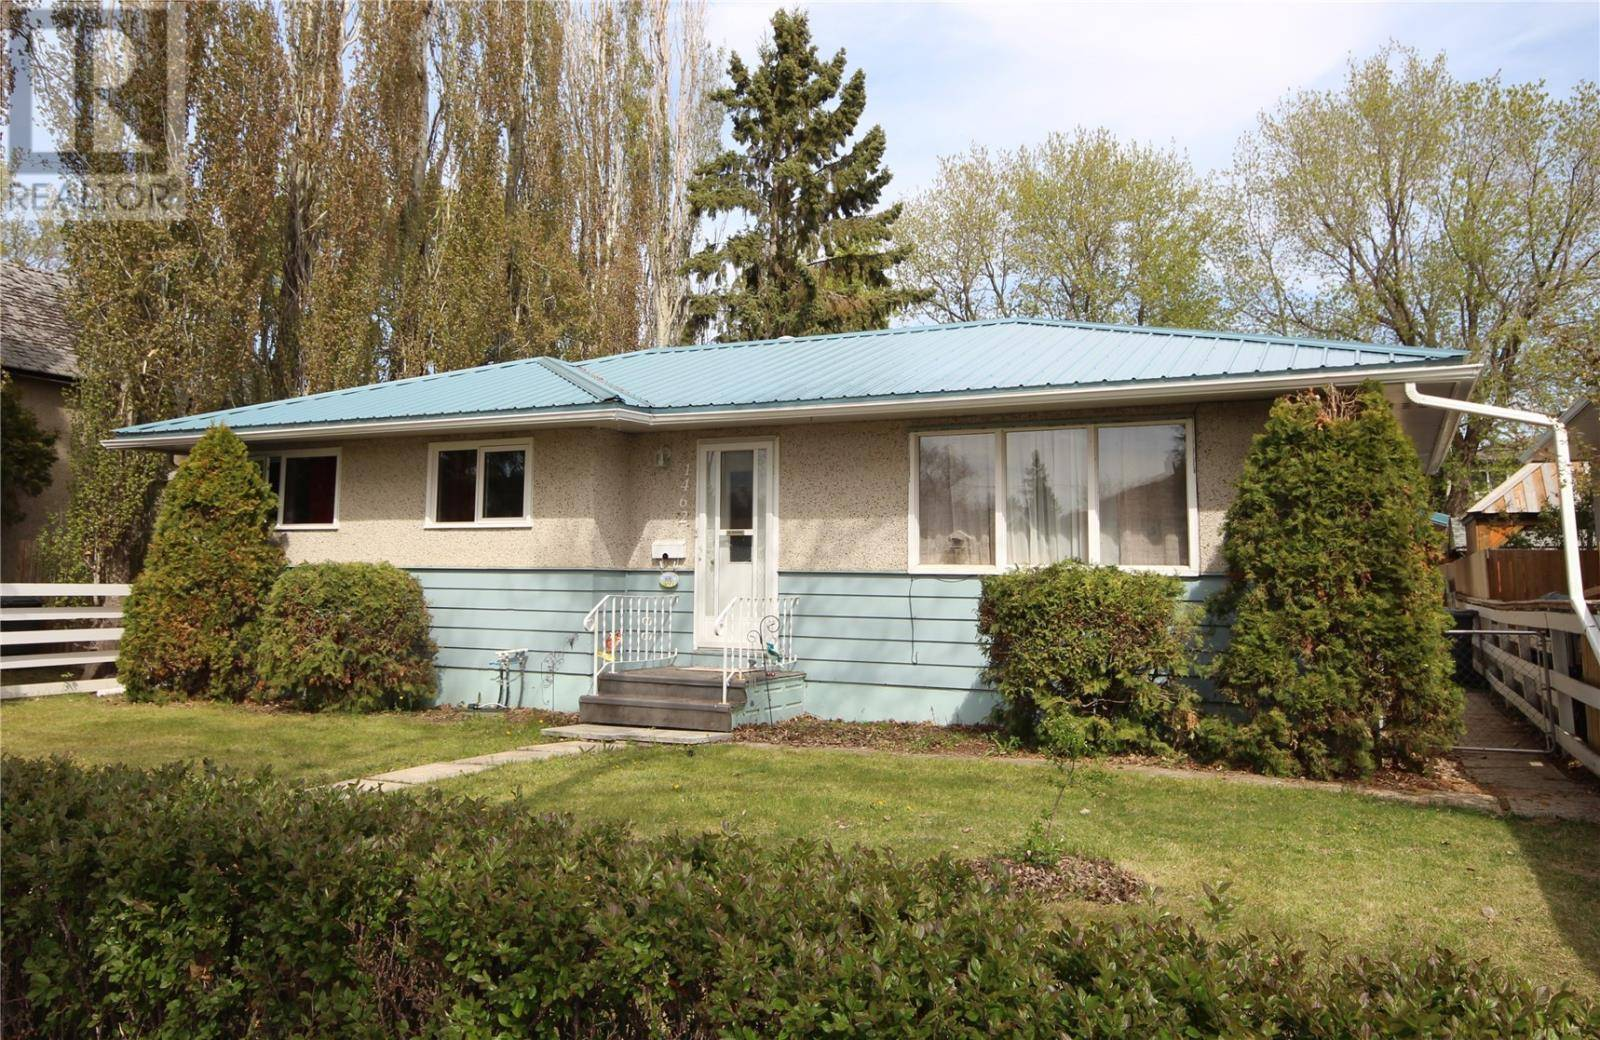 House for sale at 1462 106th St North Battleford Saskatchewan - MLS: SK772698